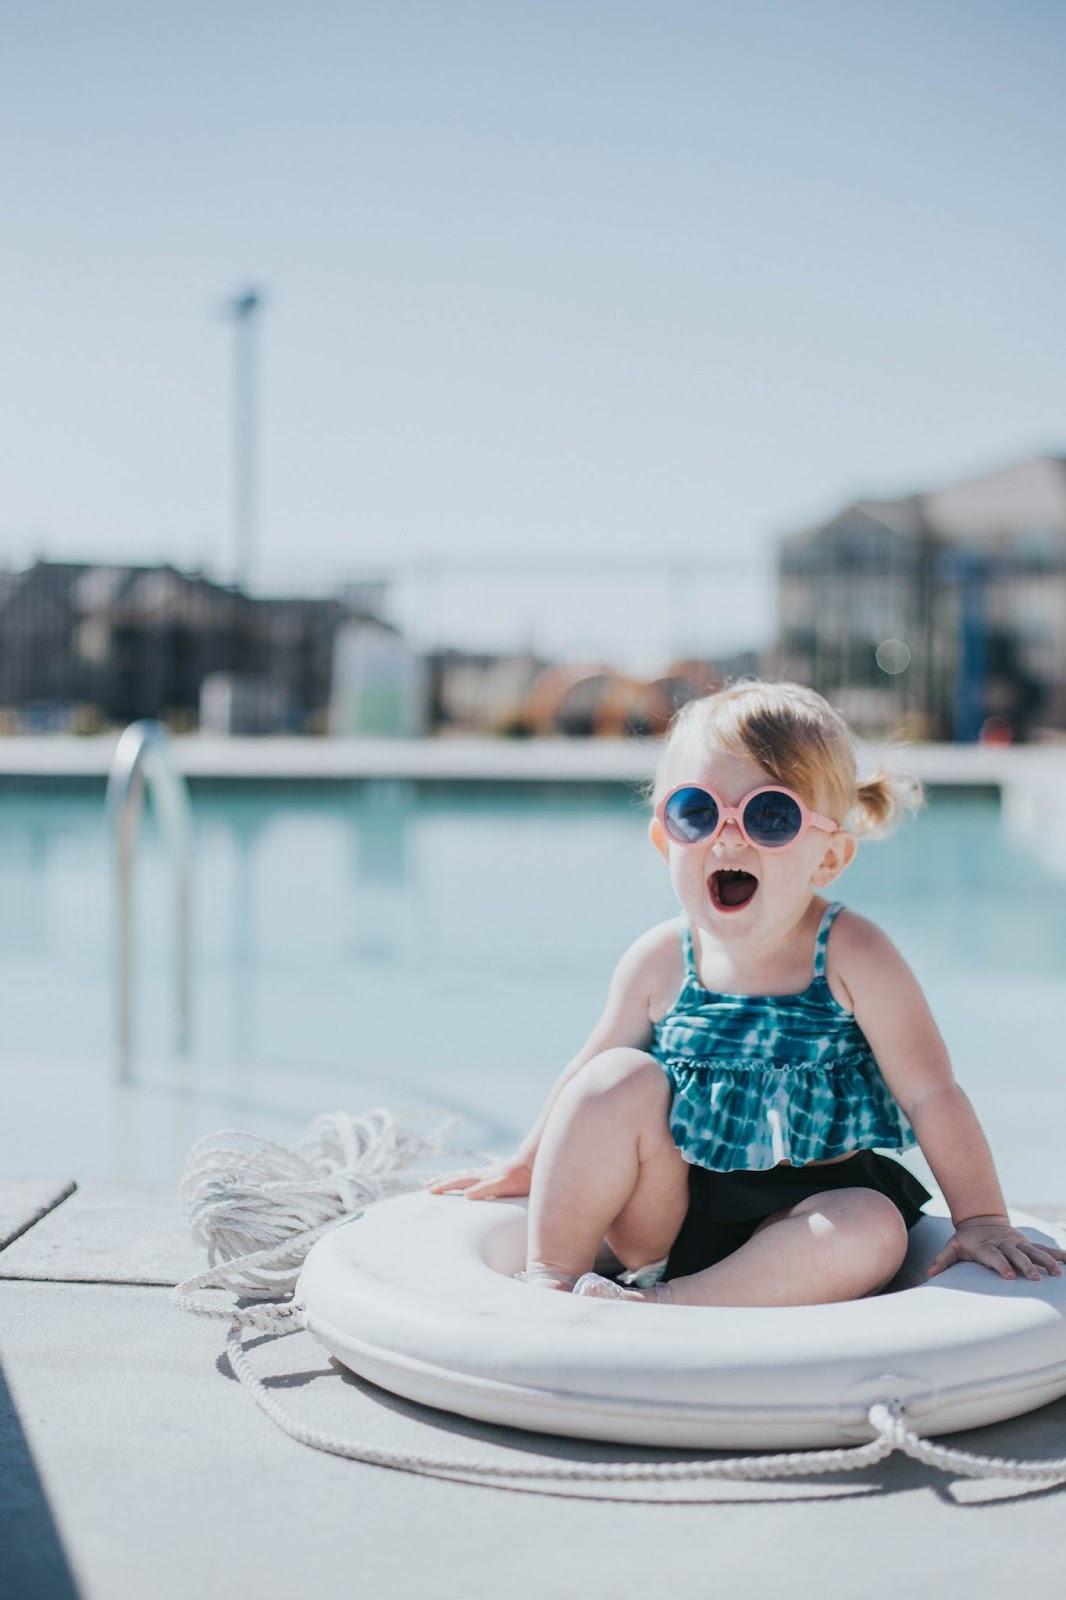 2019 Europe And America New Style Bikini KID'S Swimwear Blue Floral + Flounced Two-Piece Set